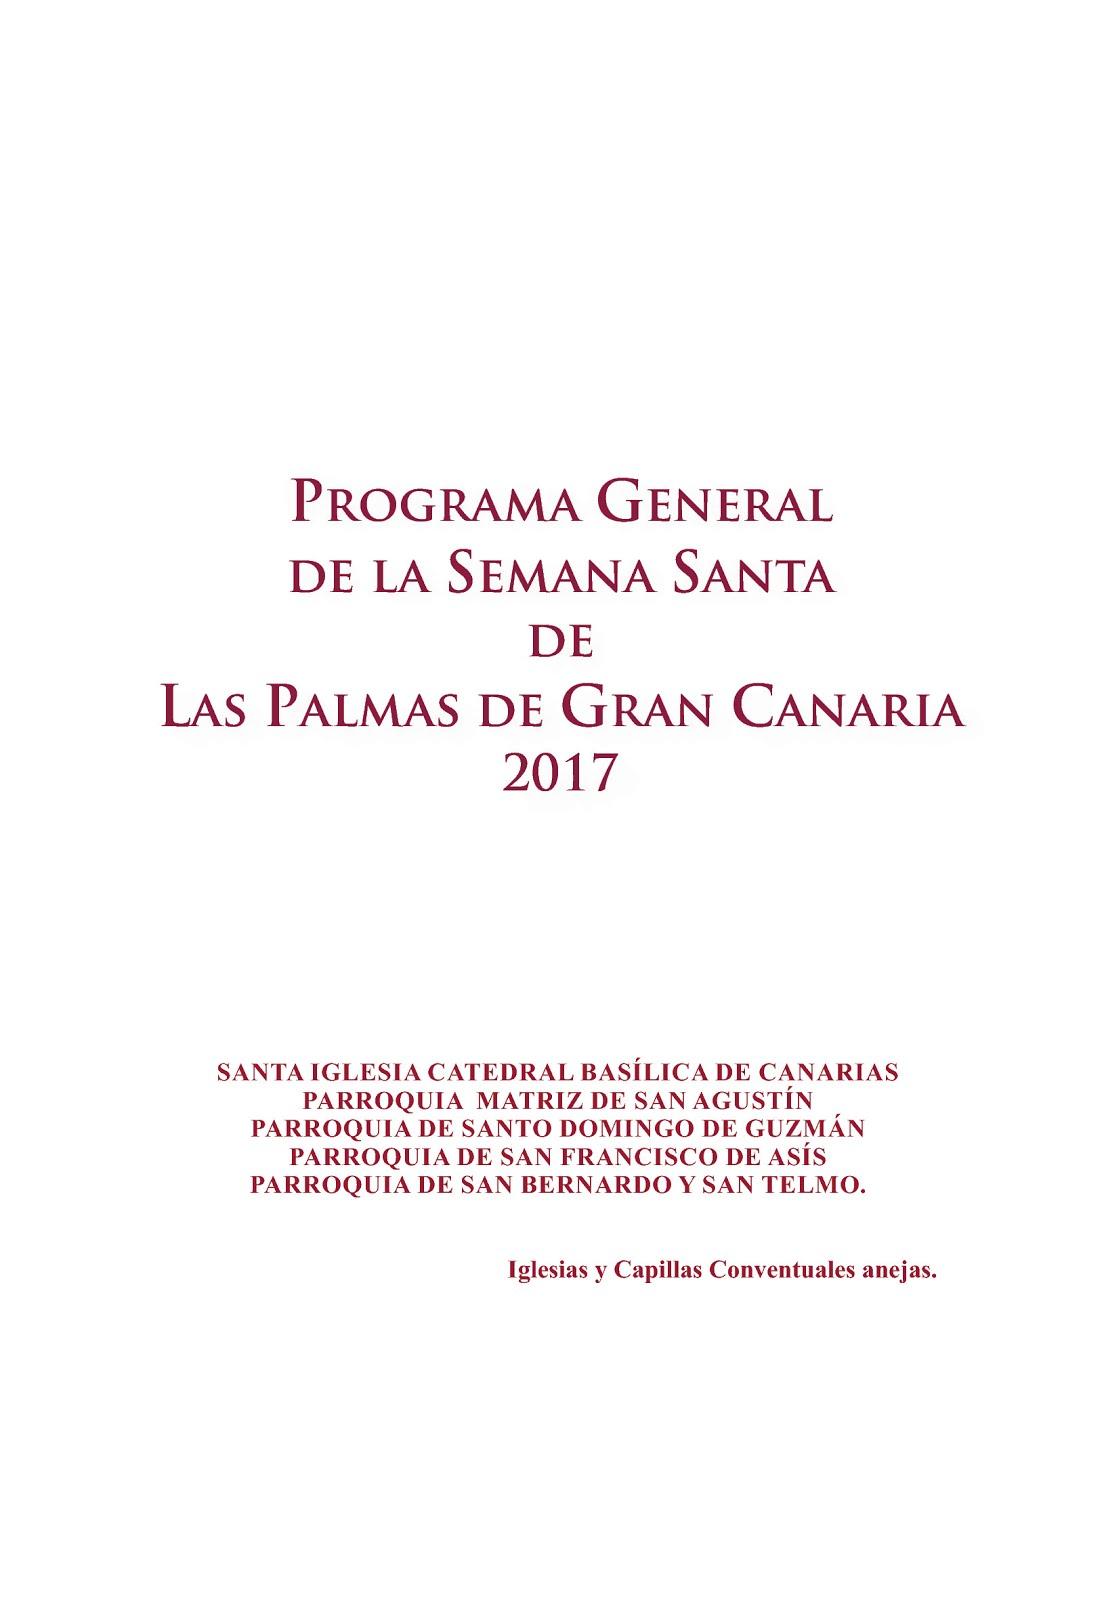 Programa Semana Santa 2017